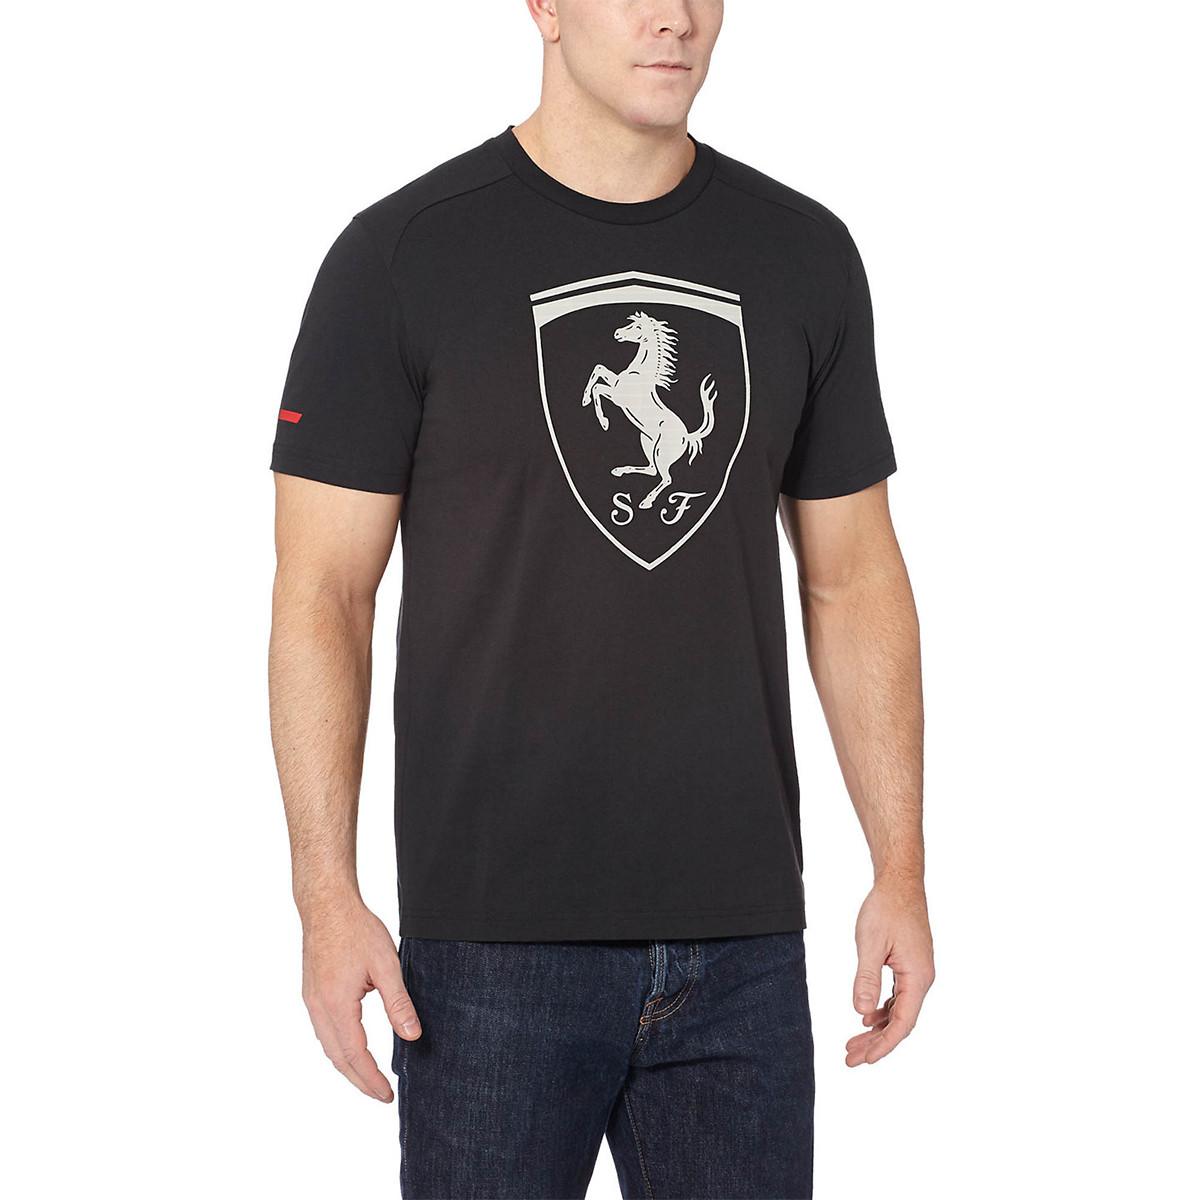 Ferrari Big Shield T Shirt Mc Homme PUMA NOIR pas cher T